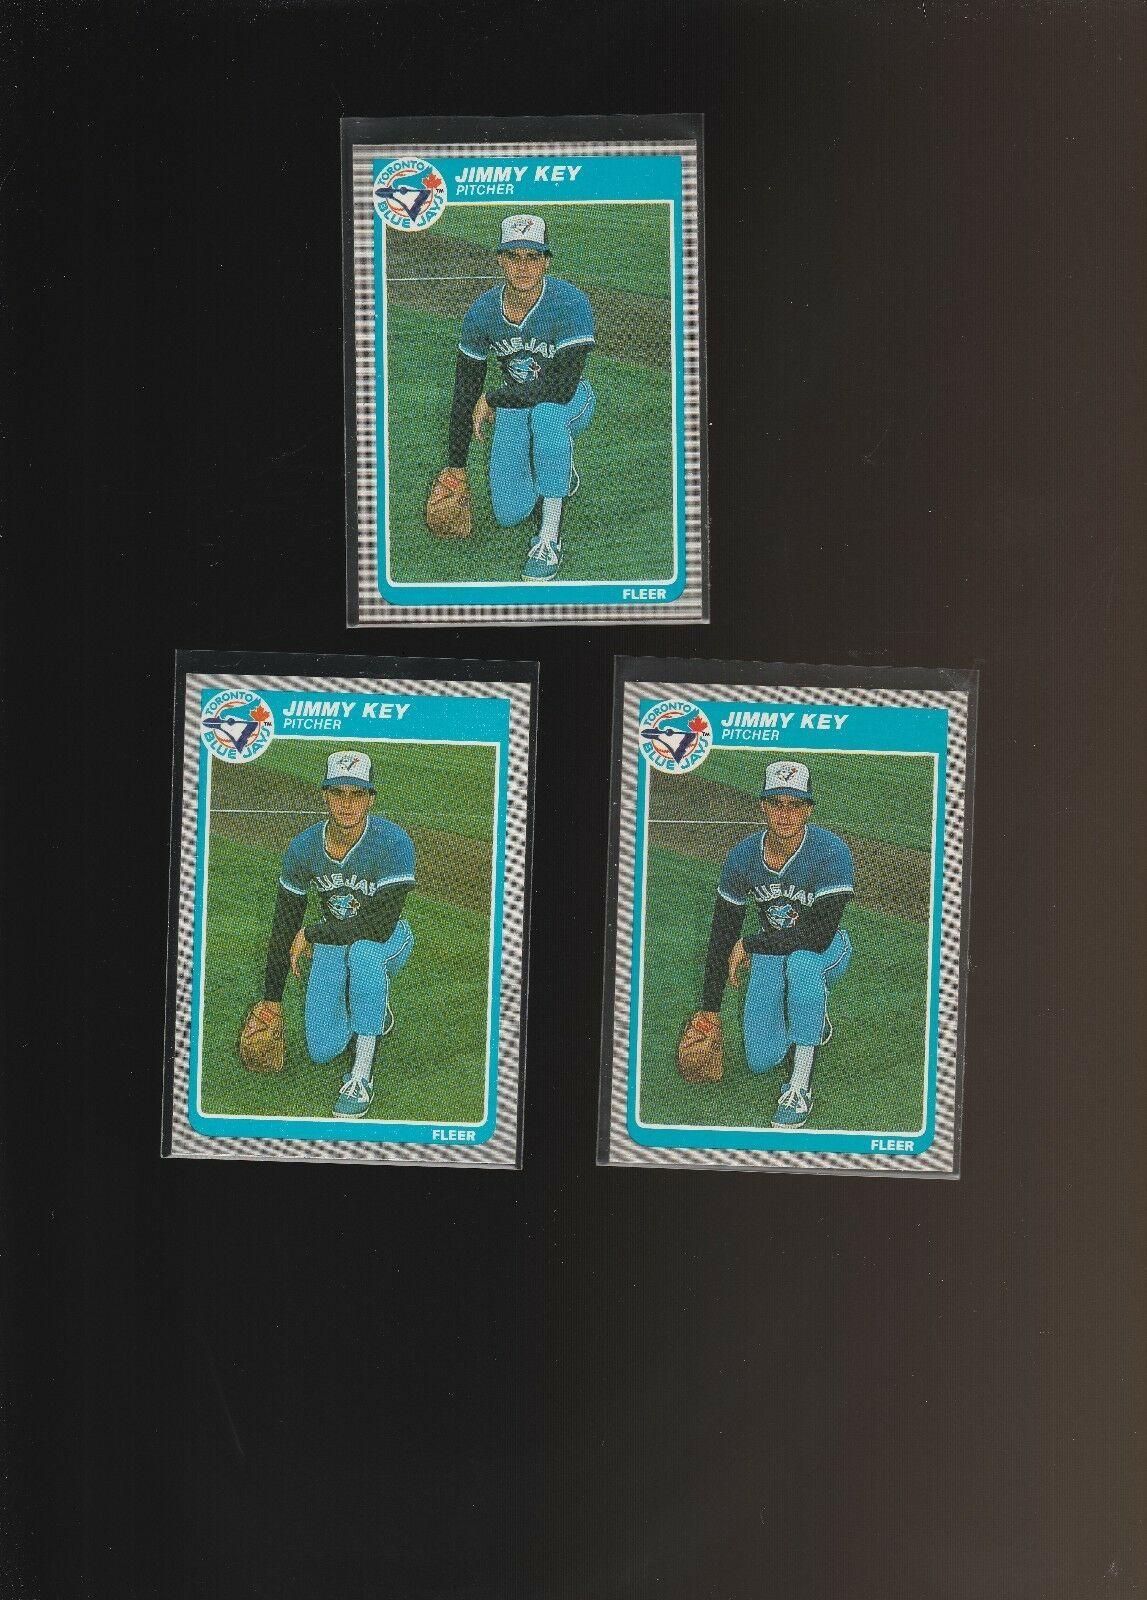 1985 Fleer #110 Jimmy Key RC Rookie Blue Jays Lot of 3